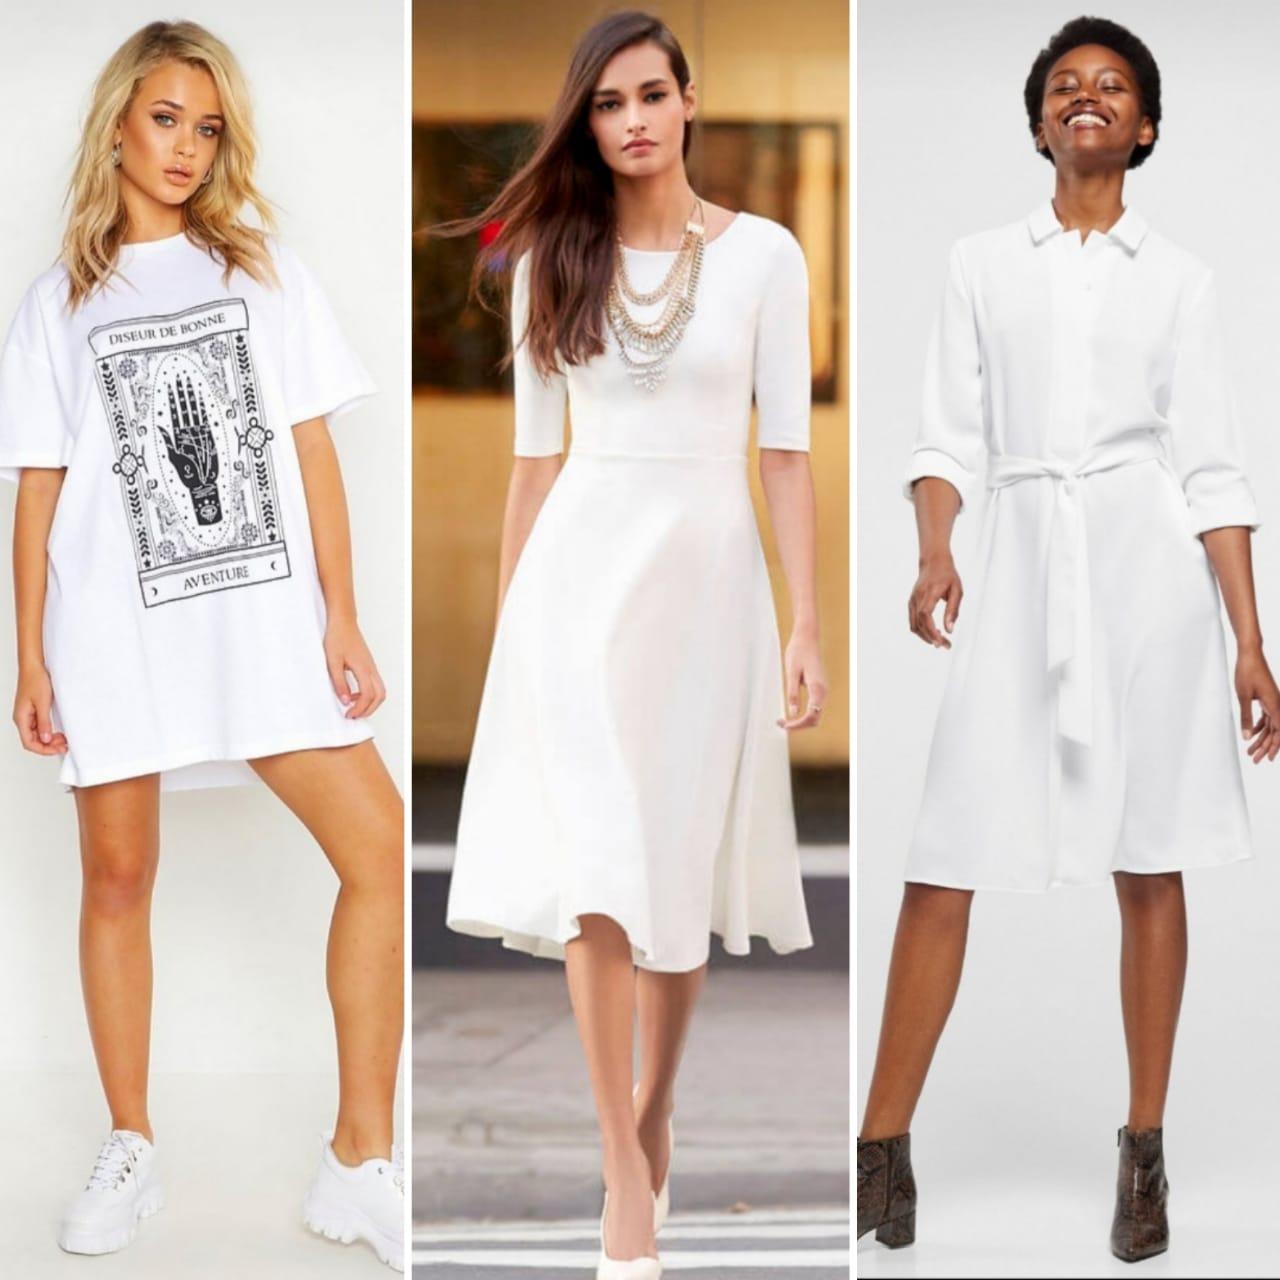 13 Tips Padupadan Busana Serba Putih Untuk Tampil Stylish